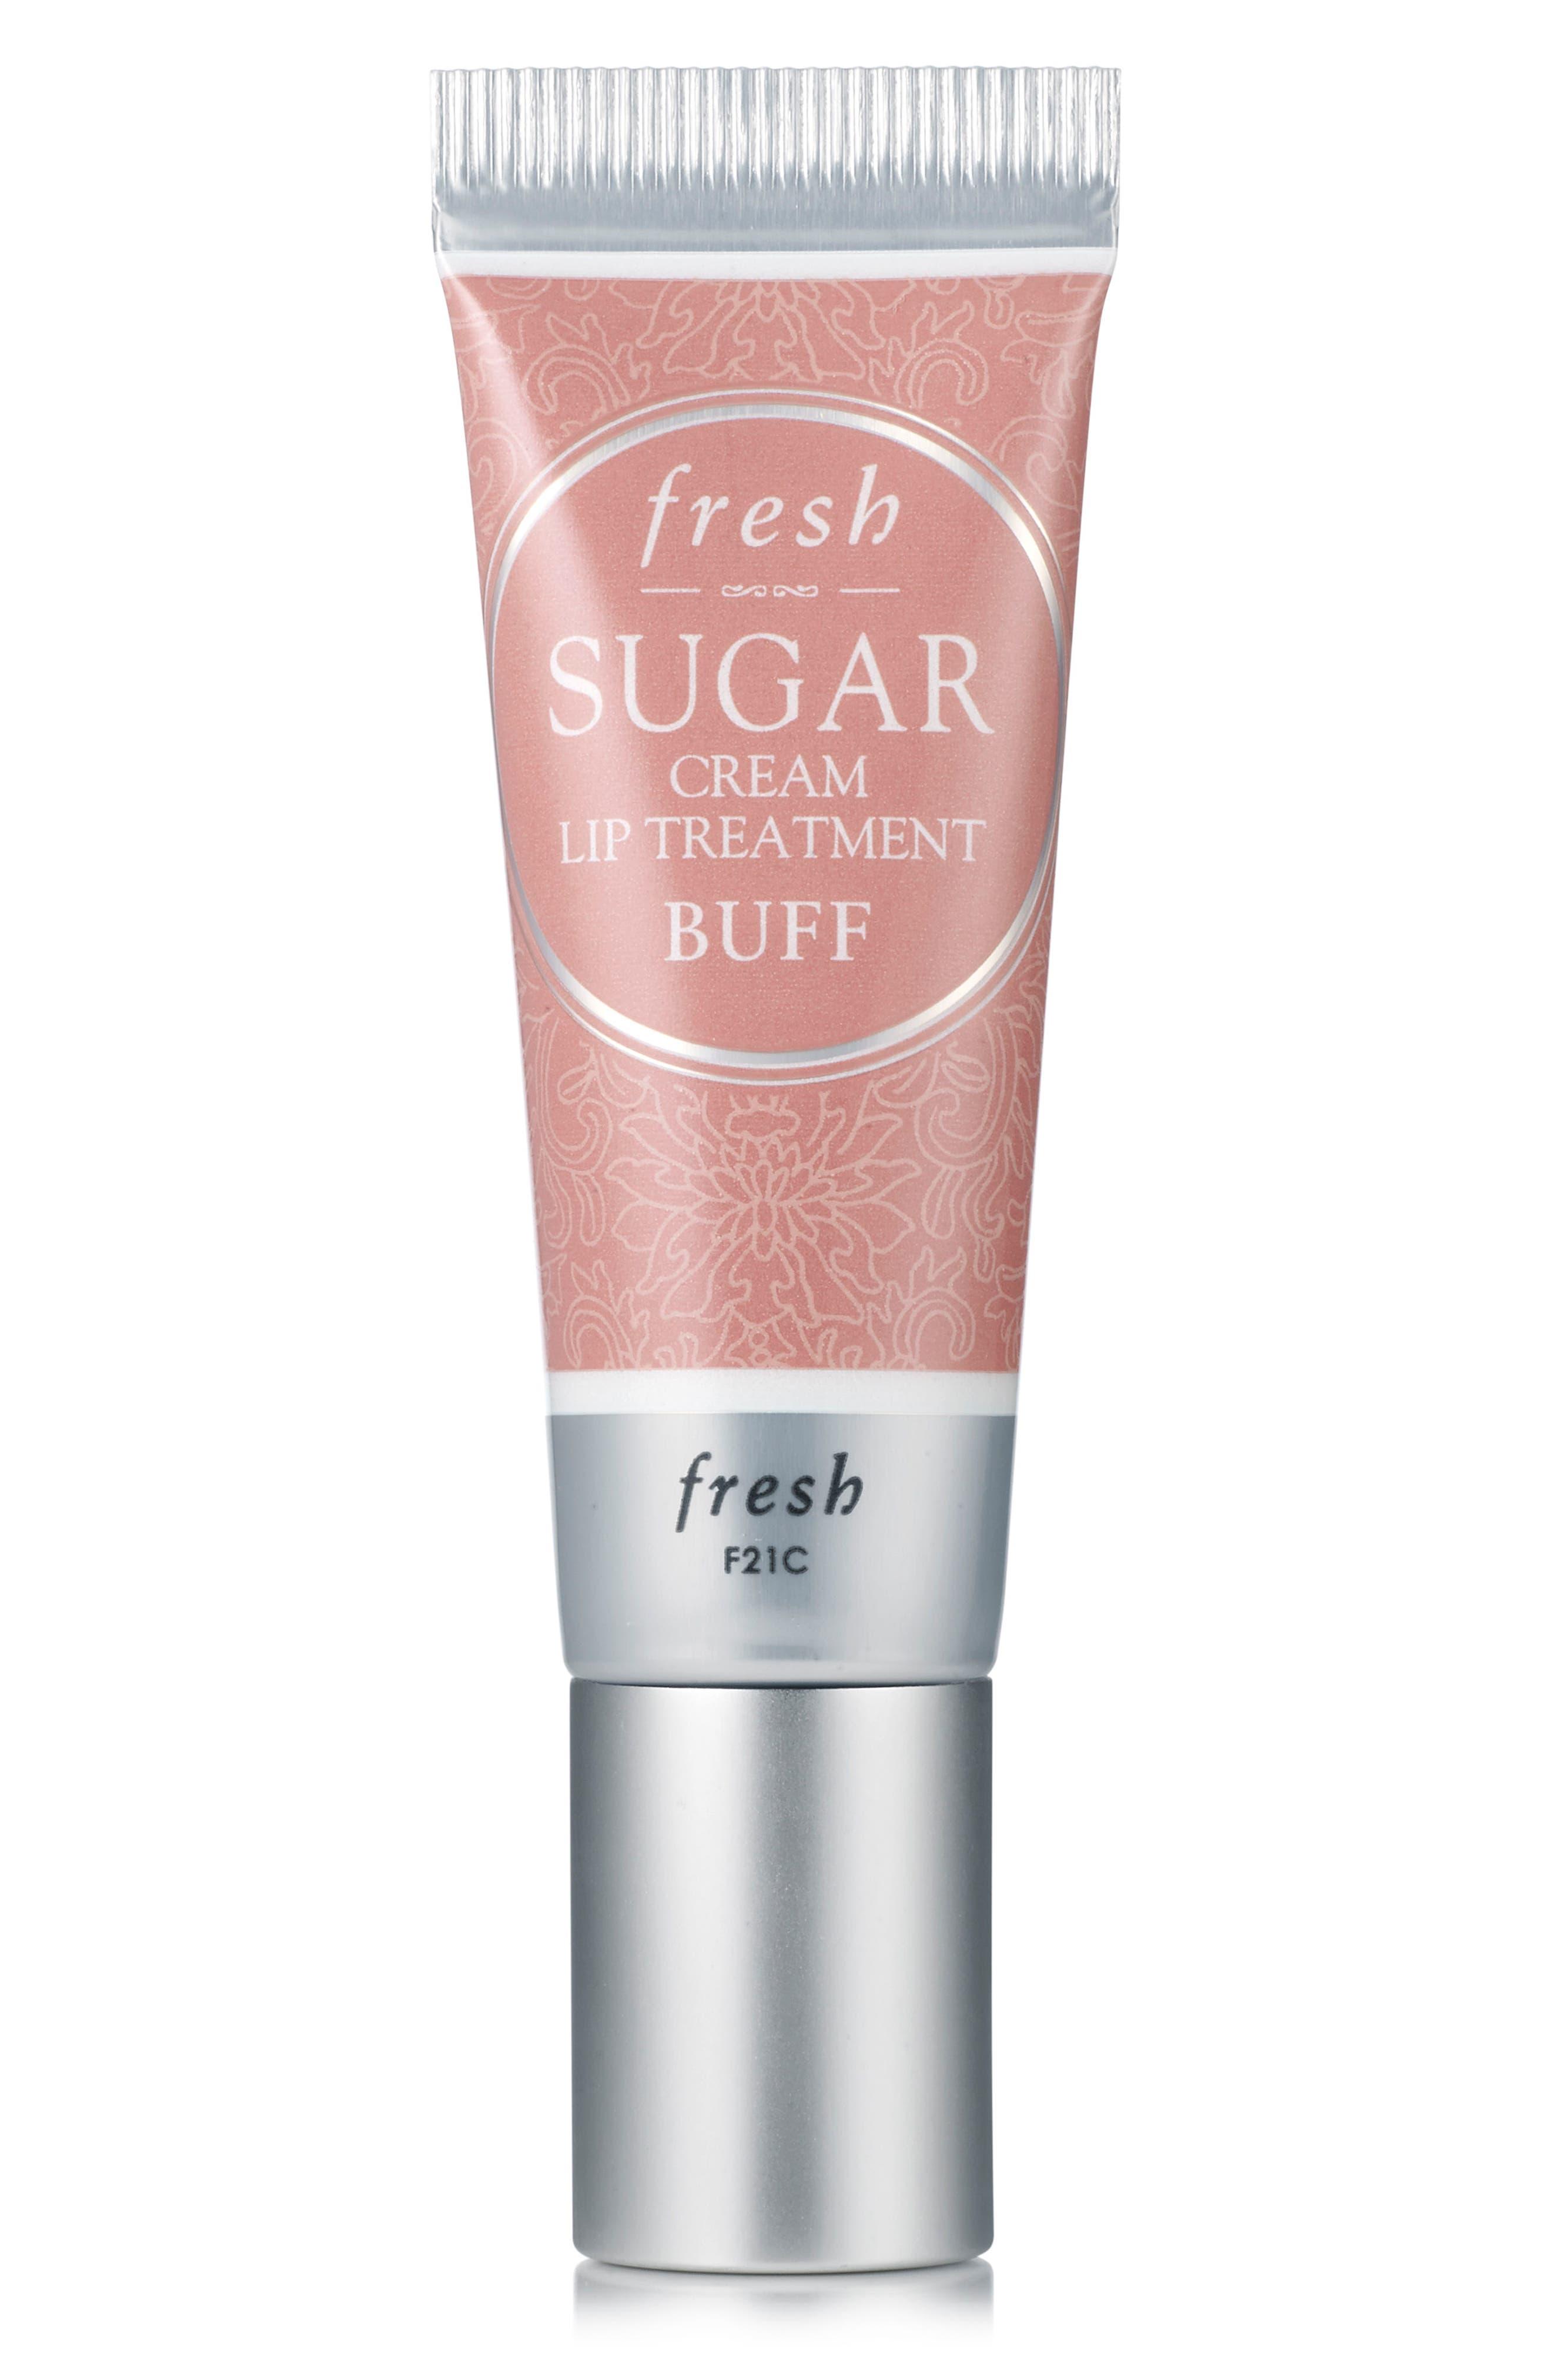 Sugar Cream Lip Treatment,                             Main thumbnail 1, color,                             BUFF